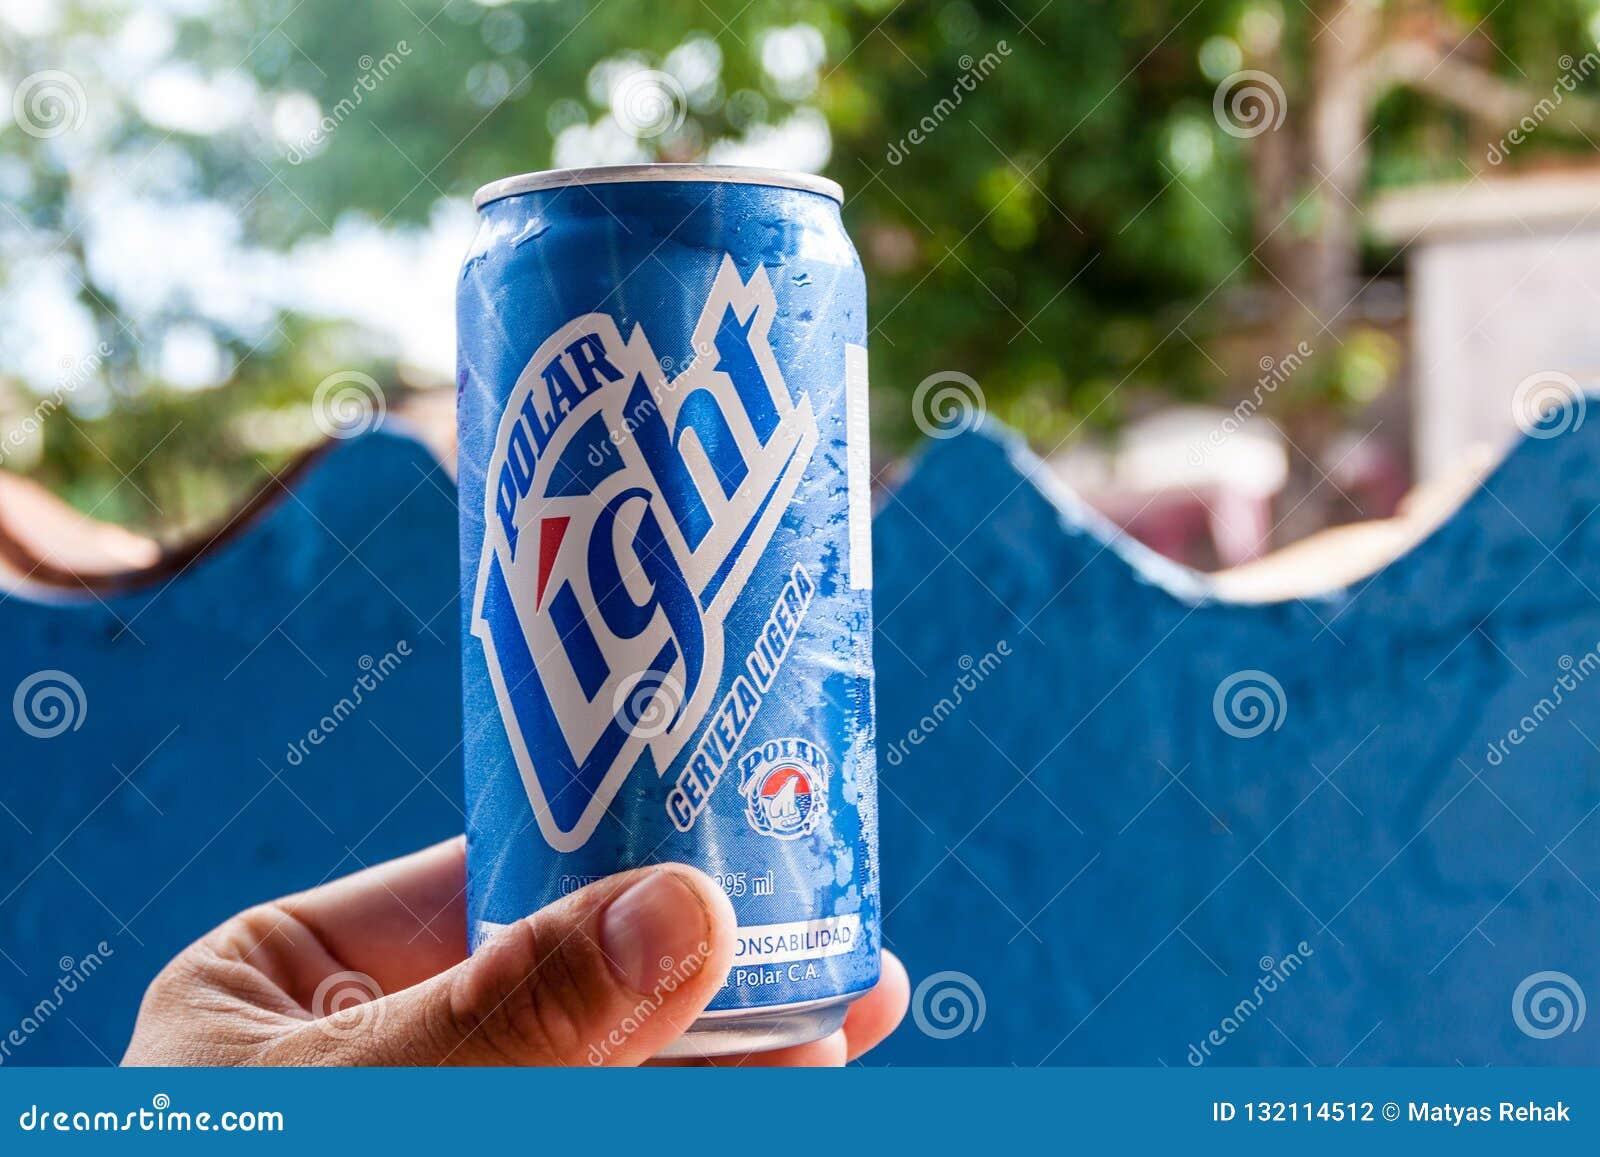 Kan van Polair bier